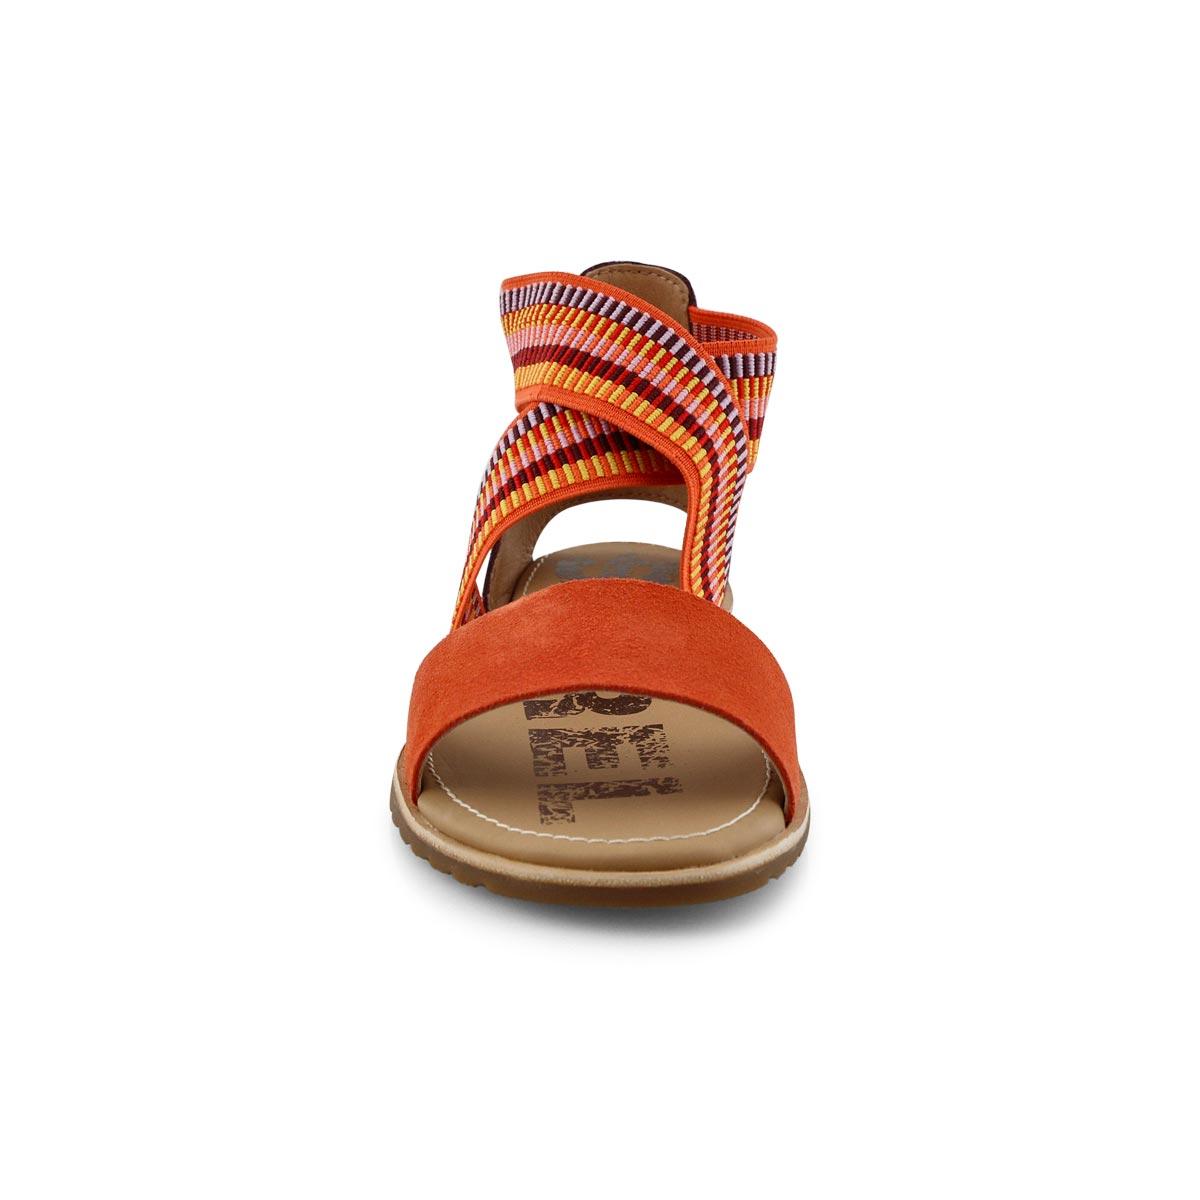 Lds Ella zing casual sandal